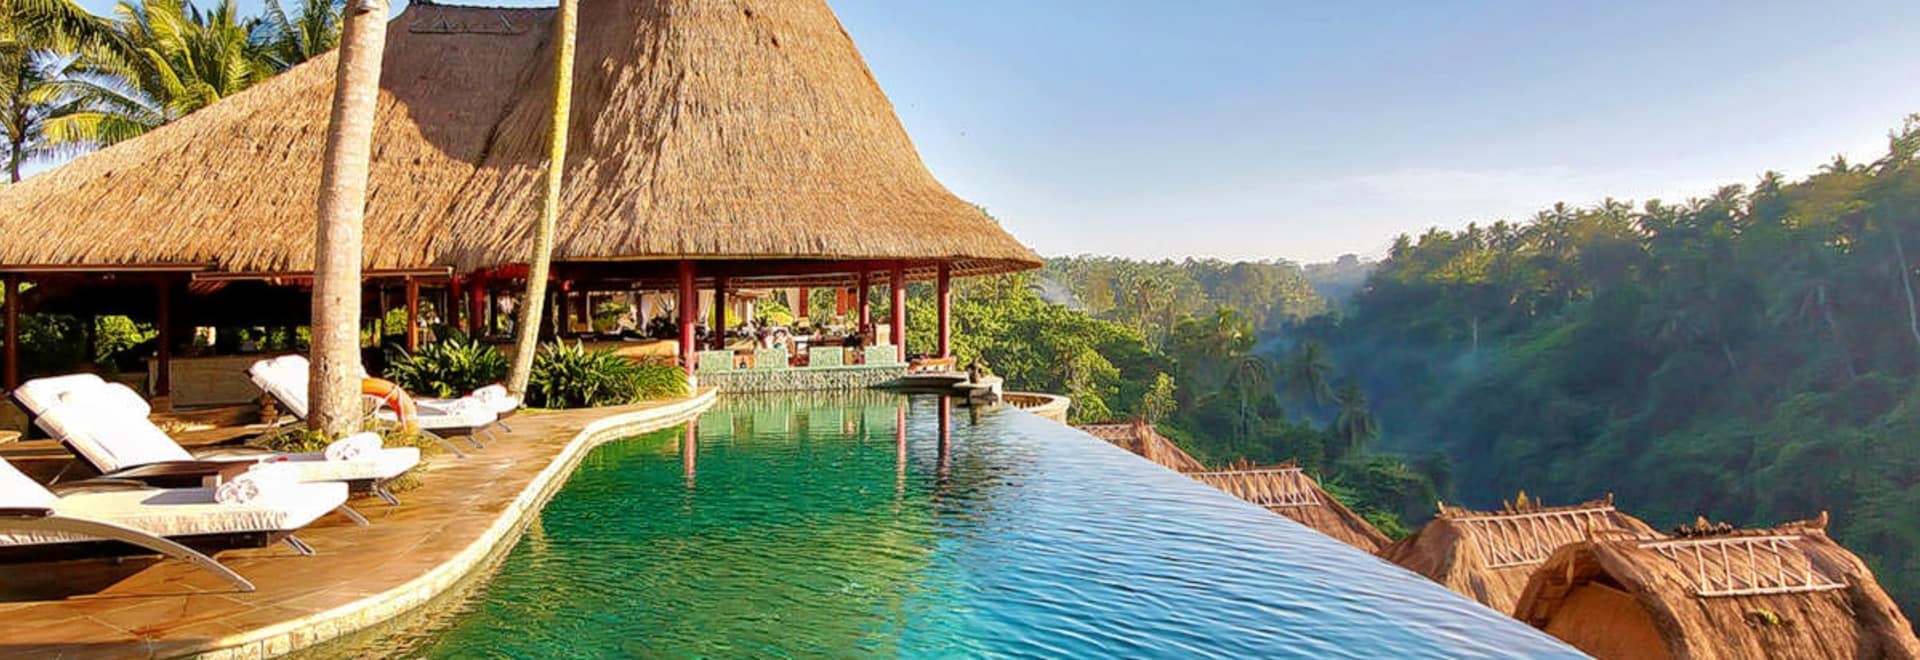 1499759732_top10-luxury-hotels-ubud.jpg